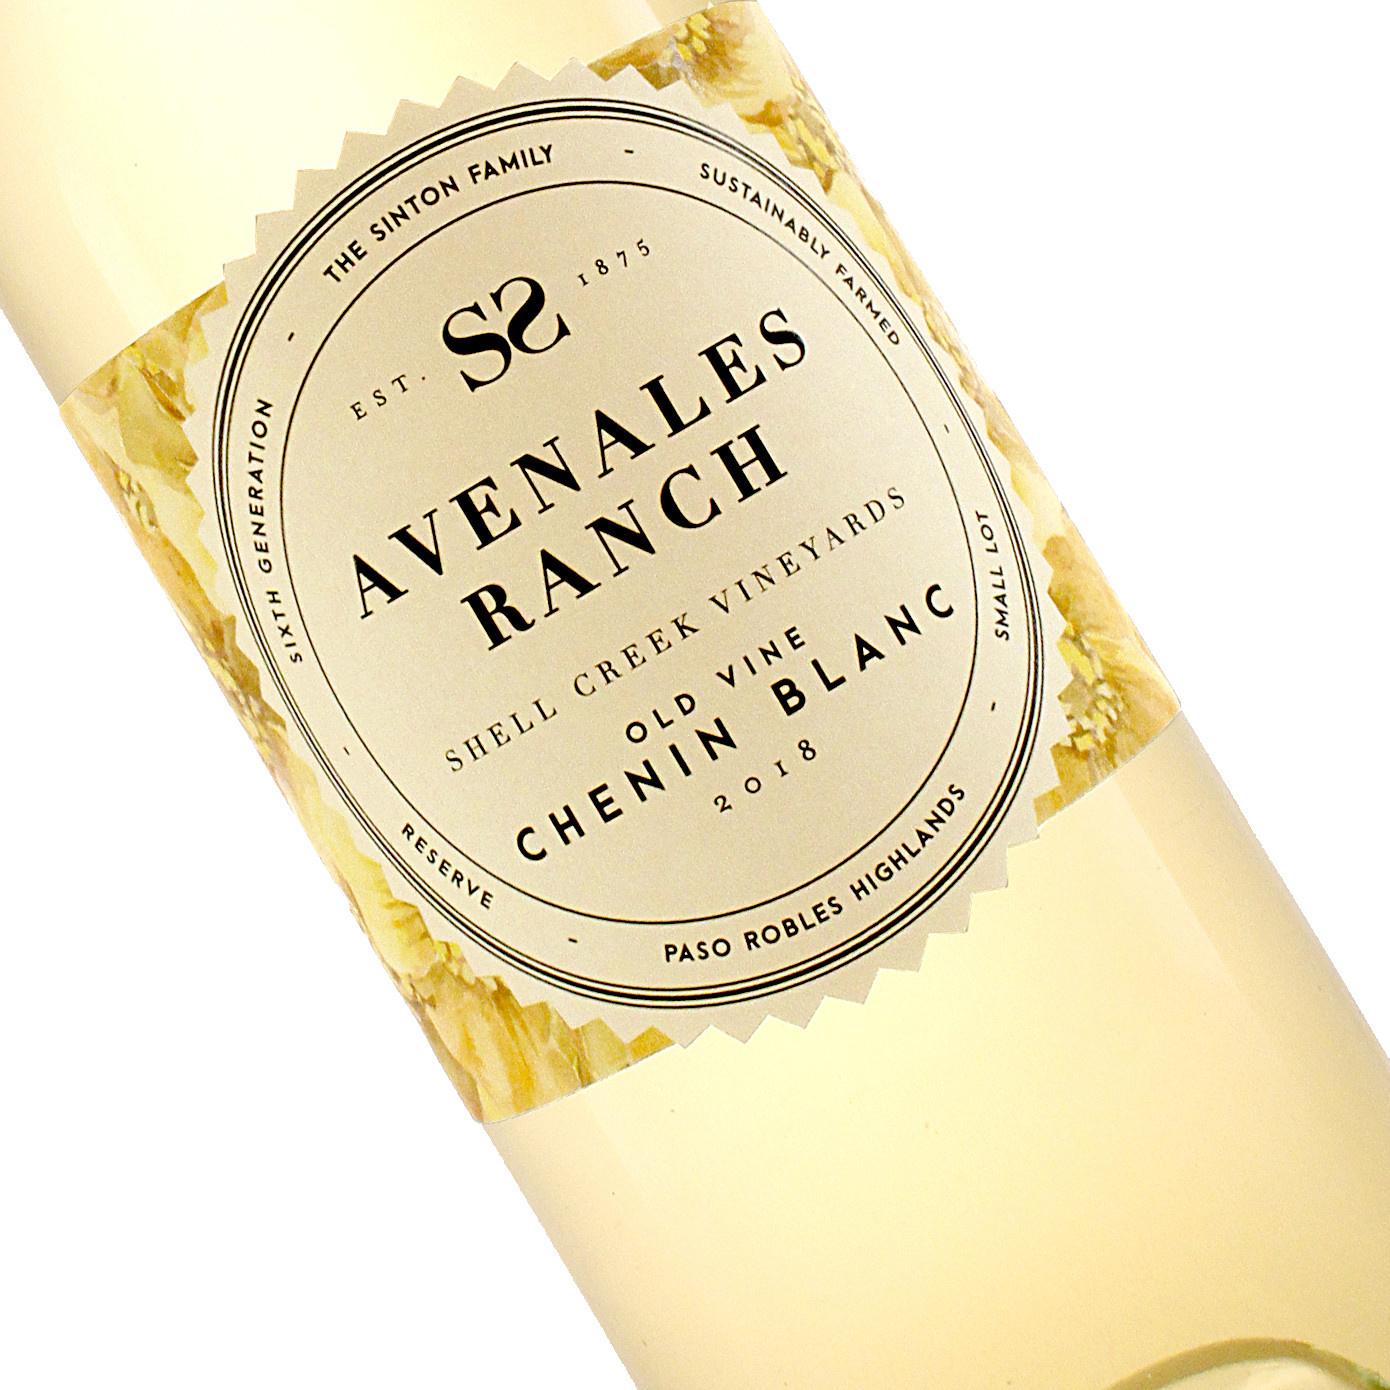 Avenales Ranch 2018 Chenin Blanc , Shell Creek Vineyards, Paso Robles